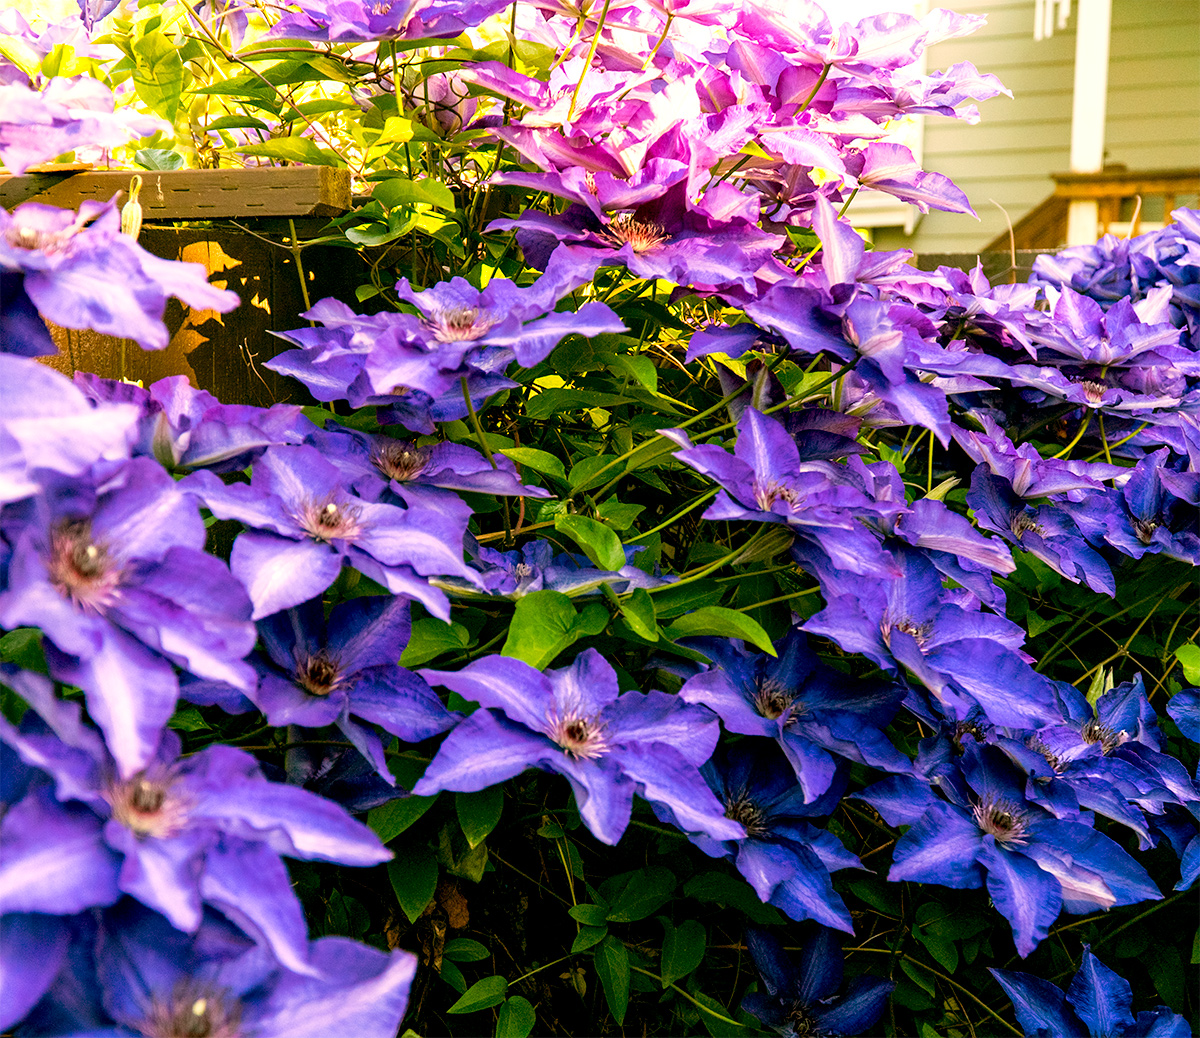 Don't you love purple?